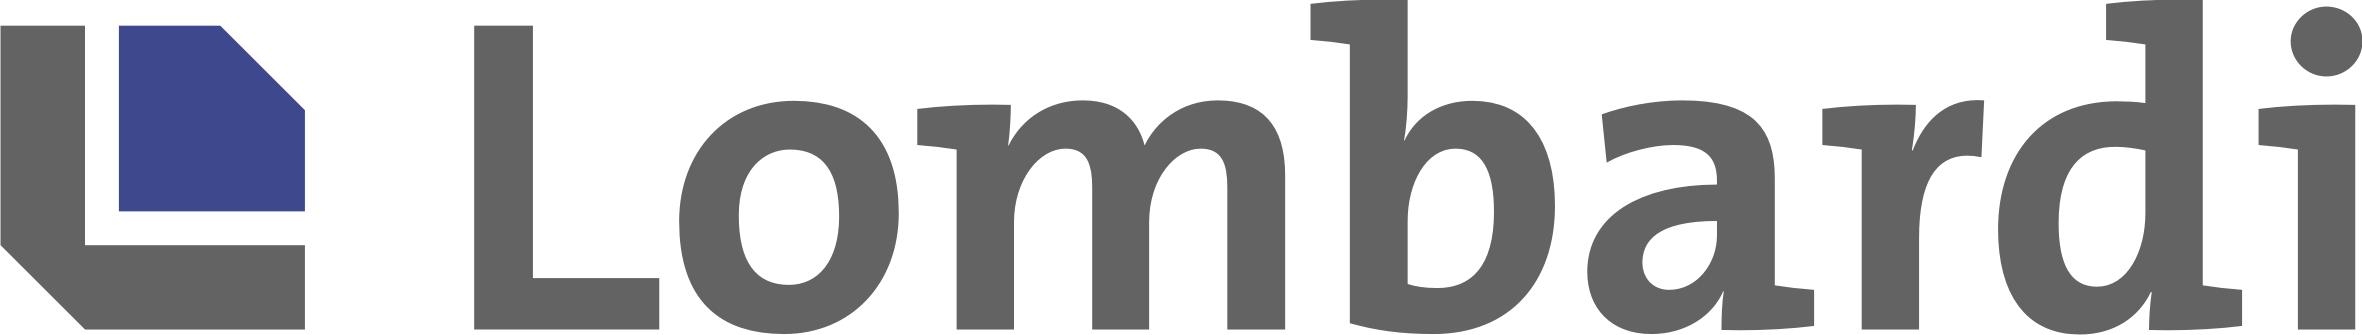 Lombardi Logo COLOR transp.png